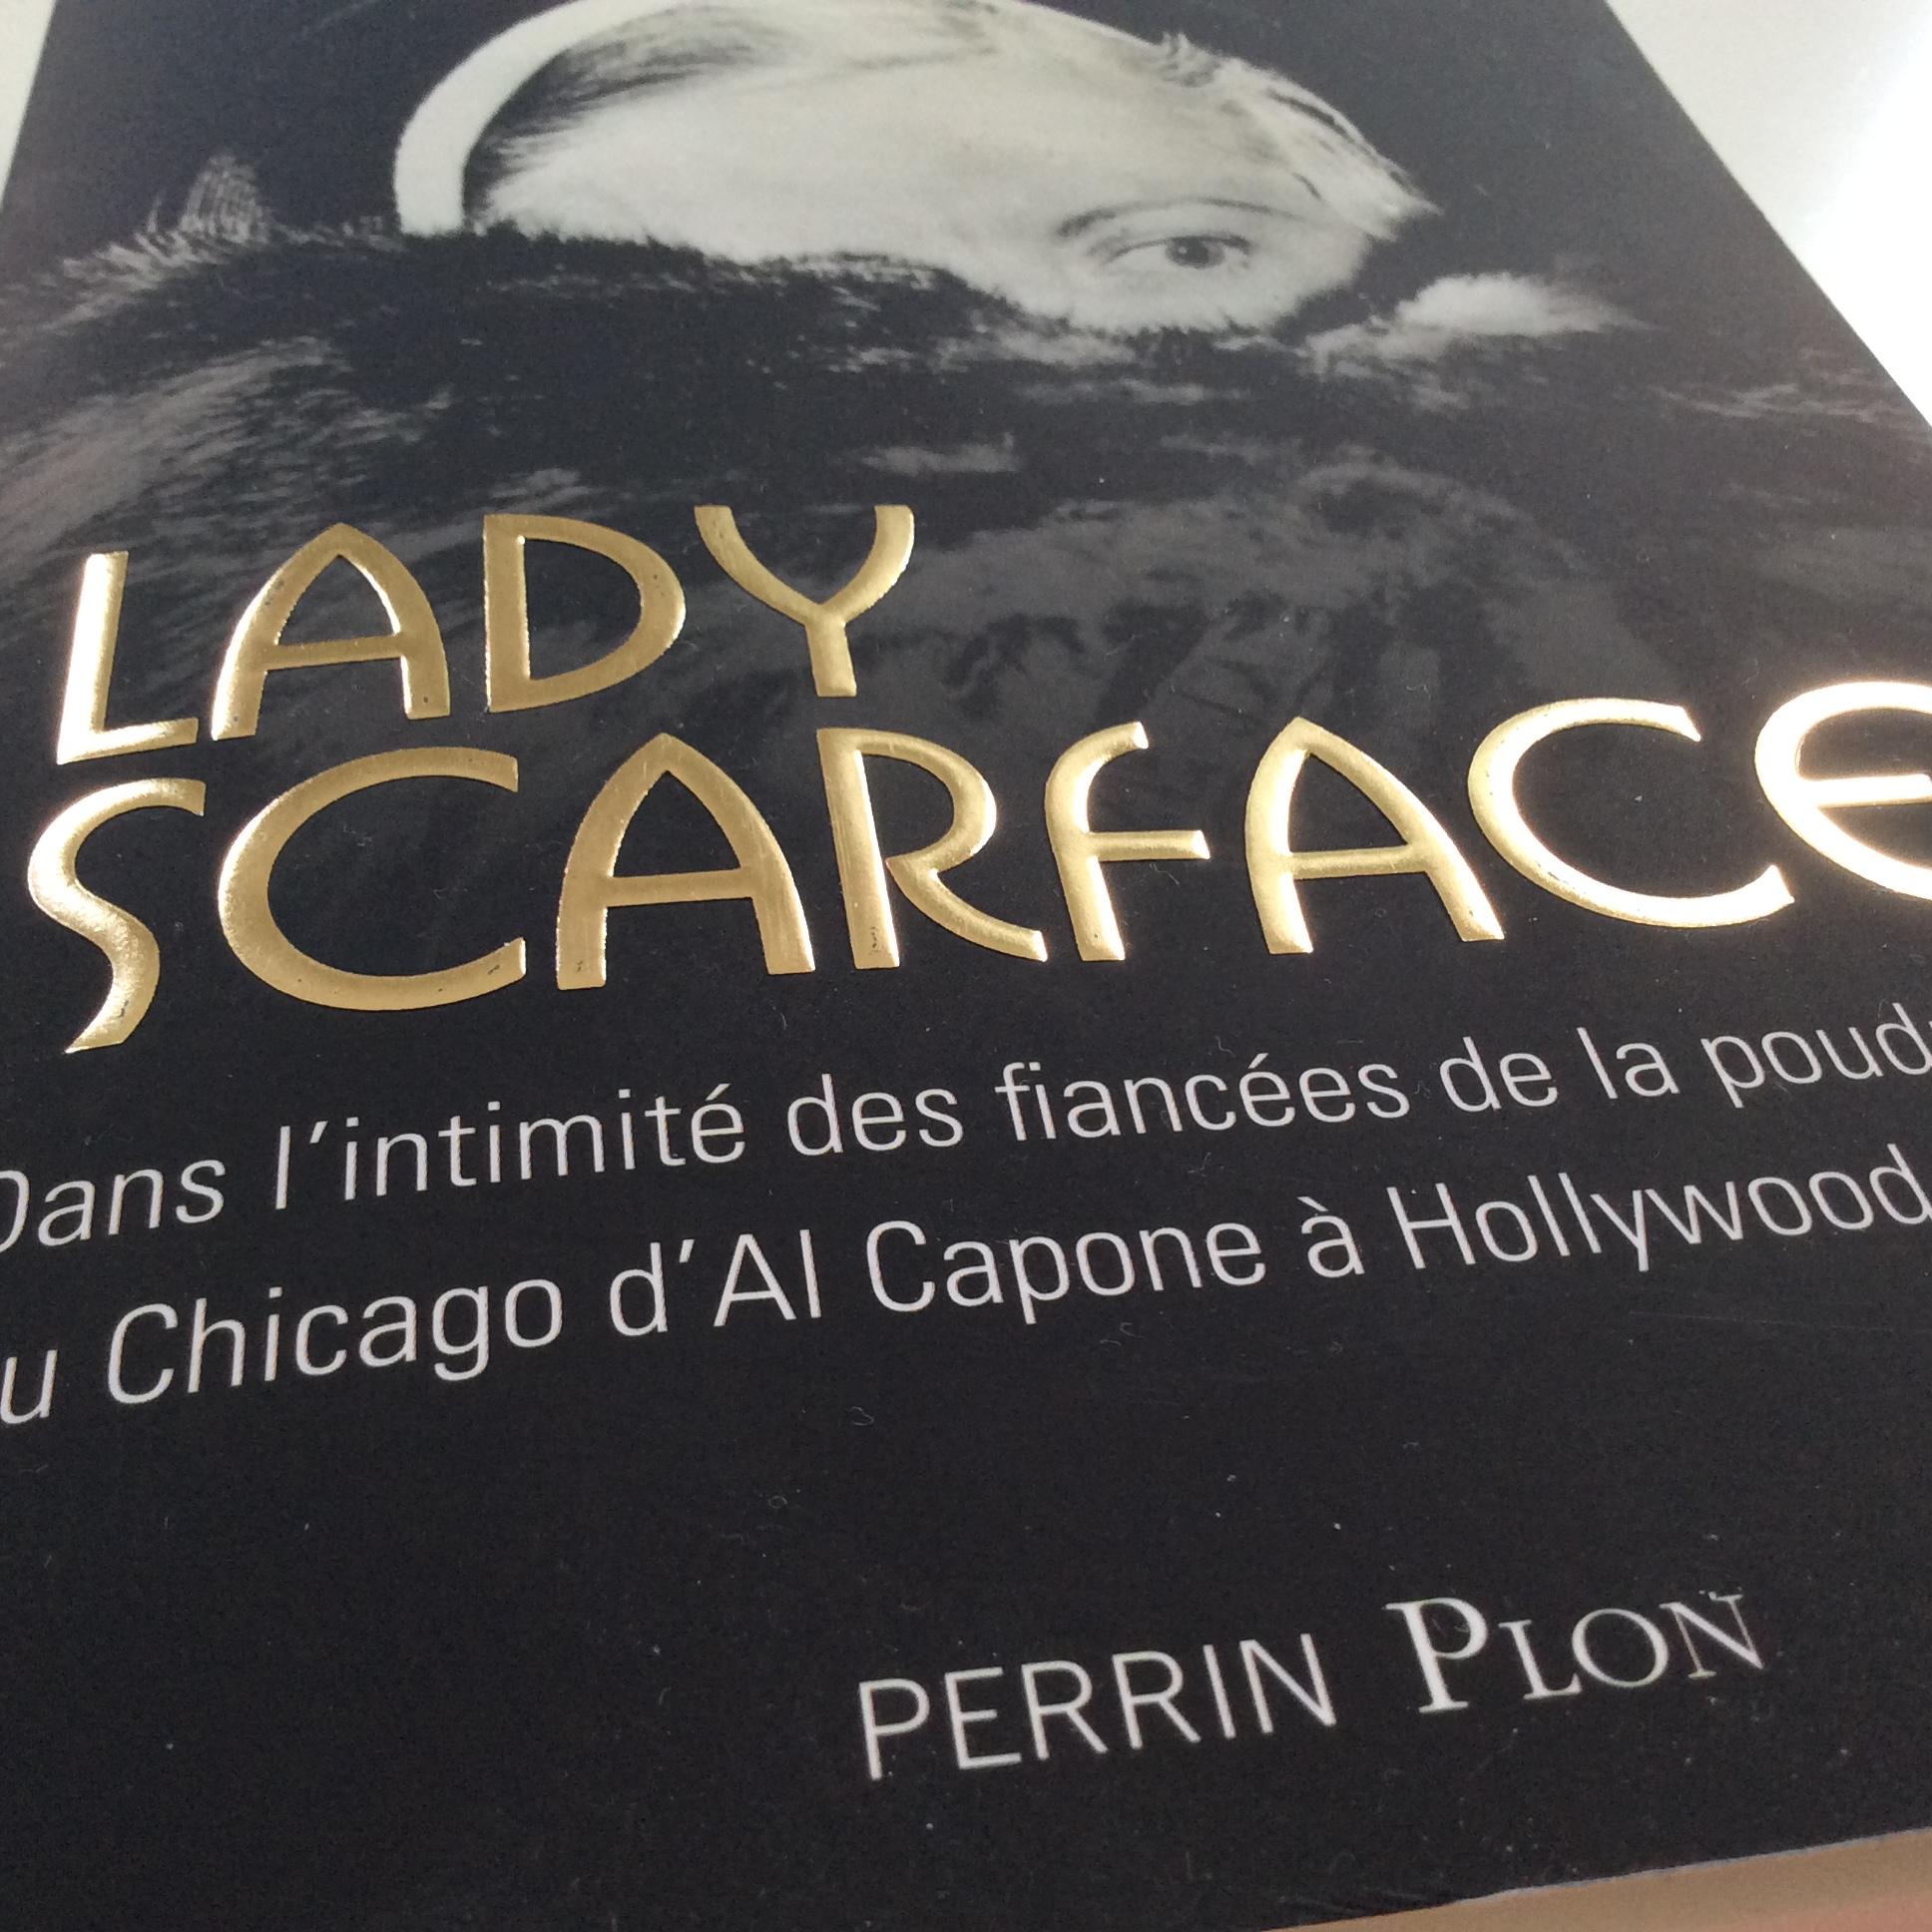 Lady Scarface - Diane Ducret